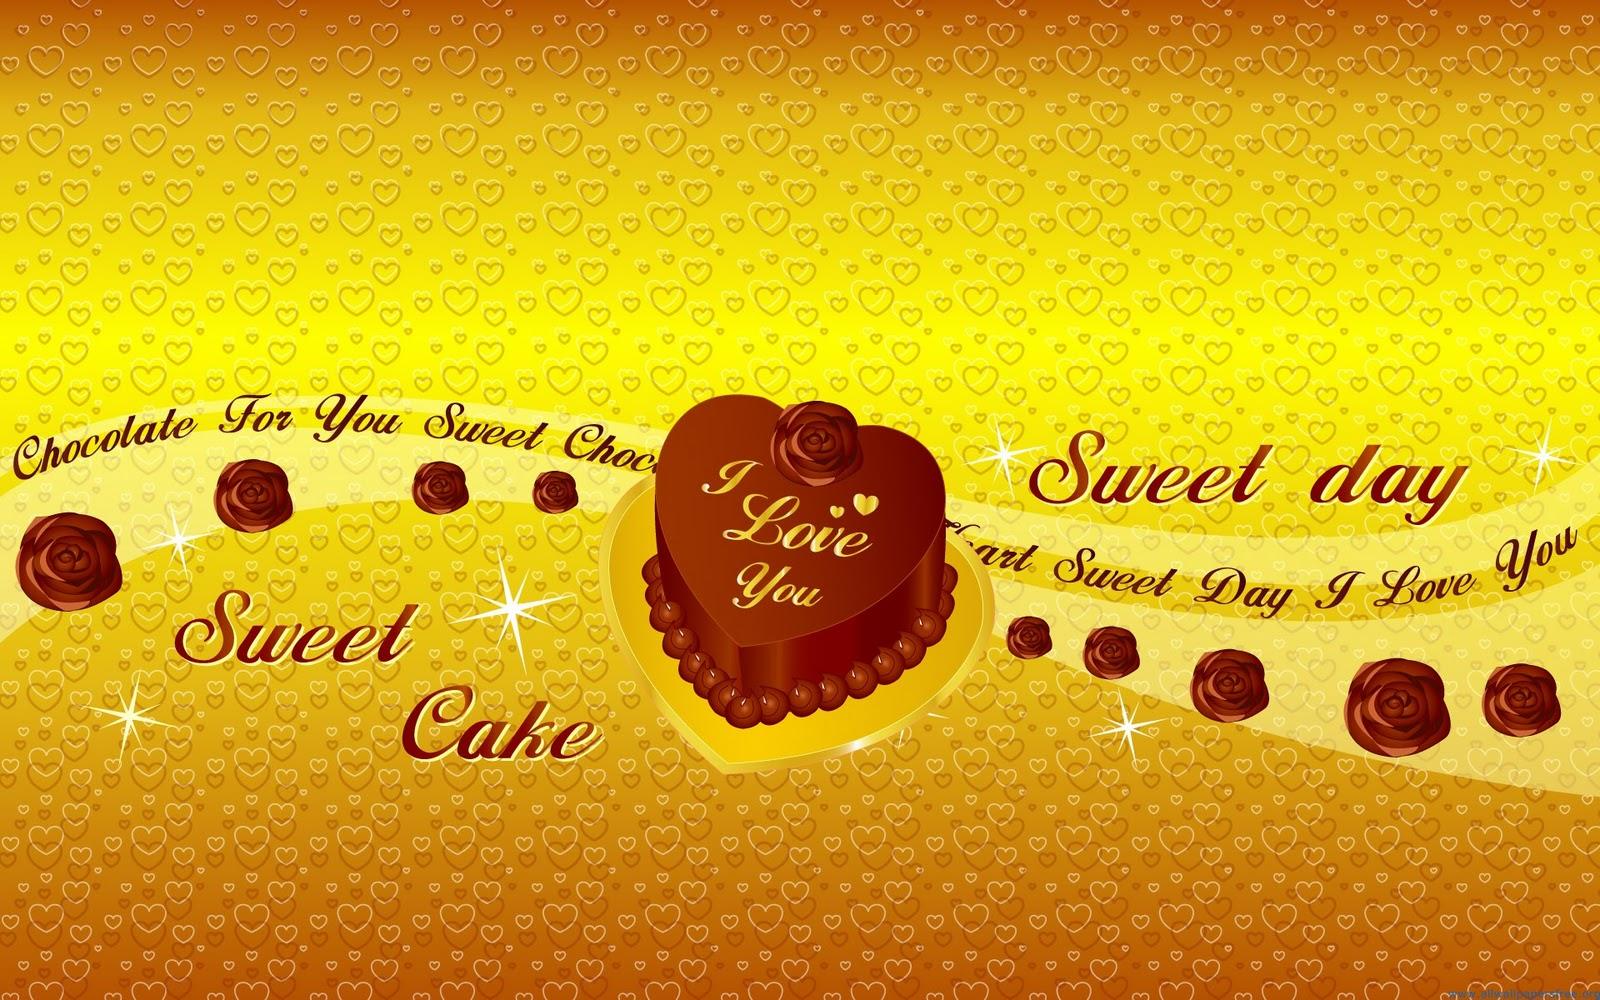 http://4.bp.blogspot.com/-I2tW46XDods/Tyo9vMiekdI/AAAAAAAABzk/QxSrN7437ok/s1600/Beautiful+Valentine%2527s+Day+HD+Widescreen+Wallpapers+%252847%2529.jpg